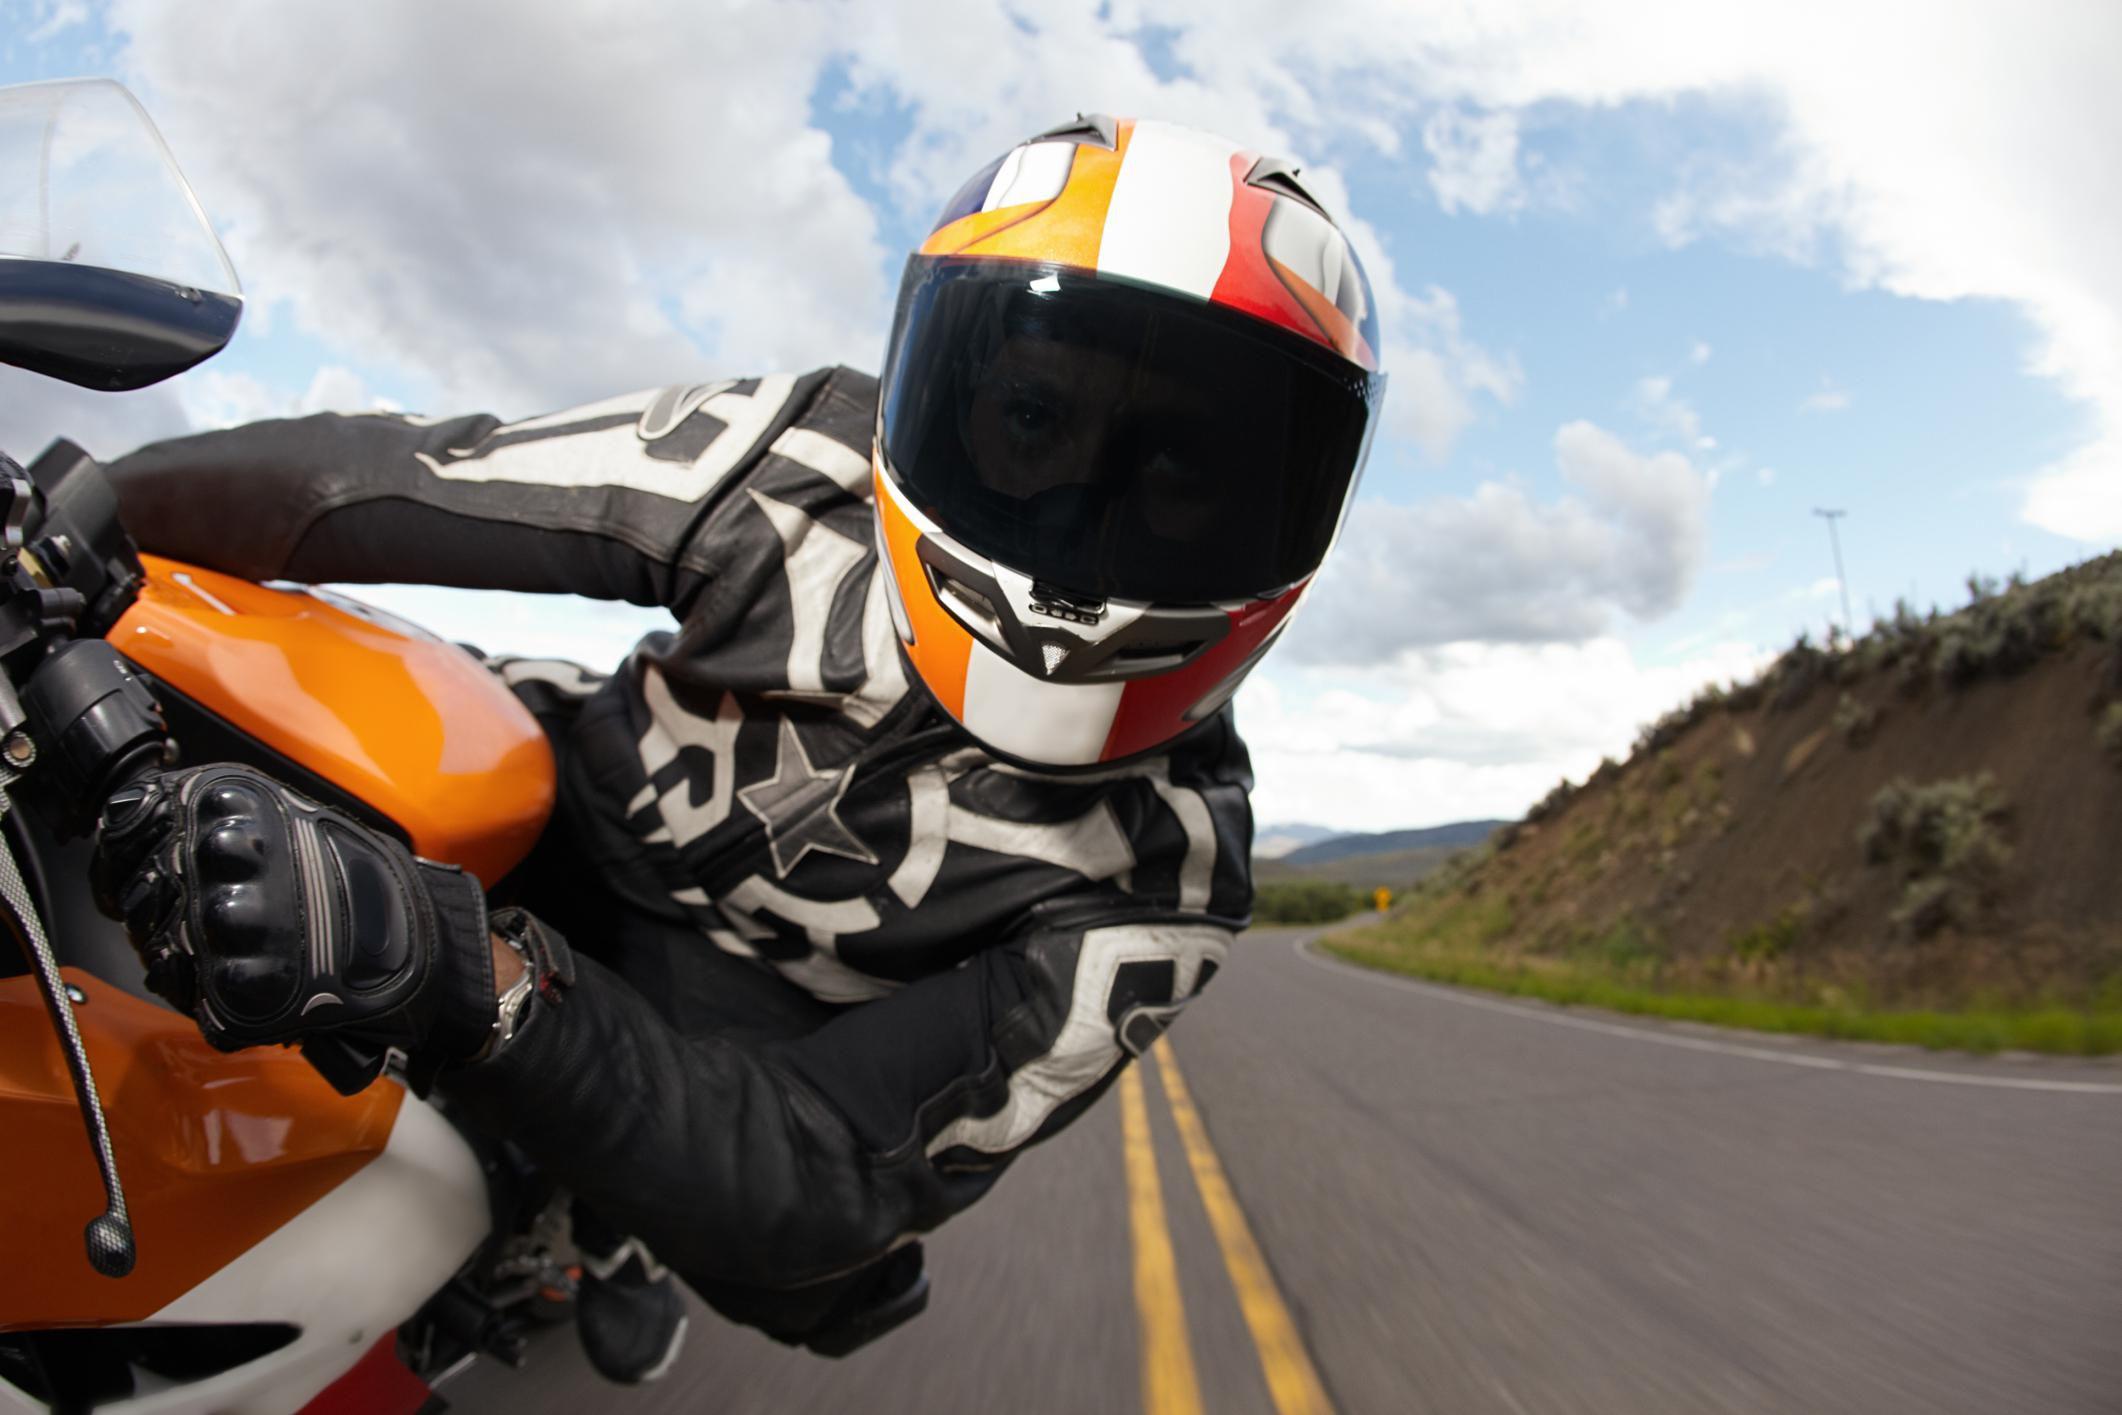 Motorcycle Restoration Guide